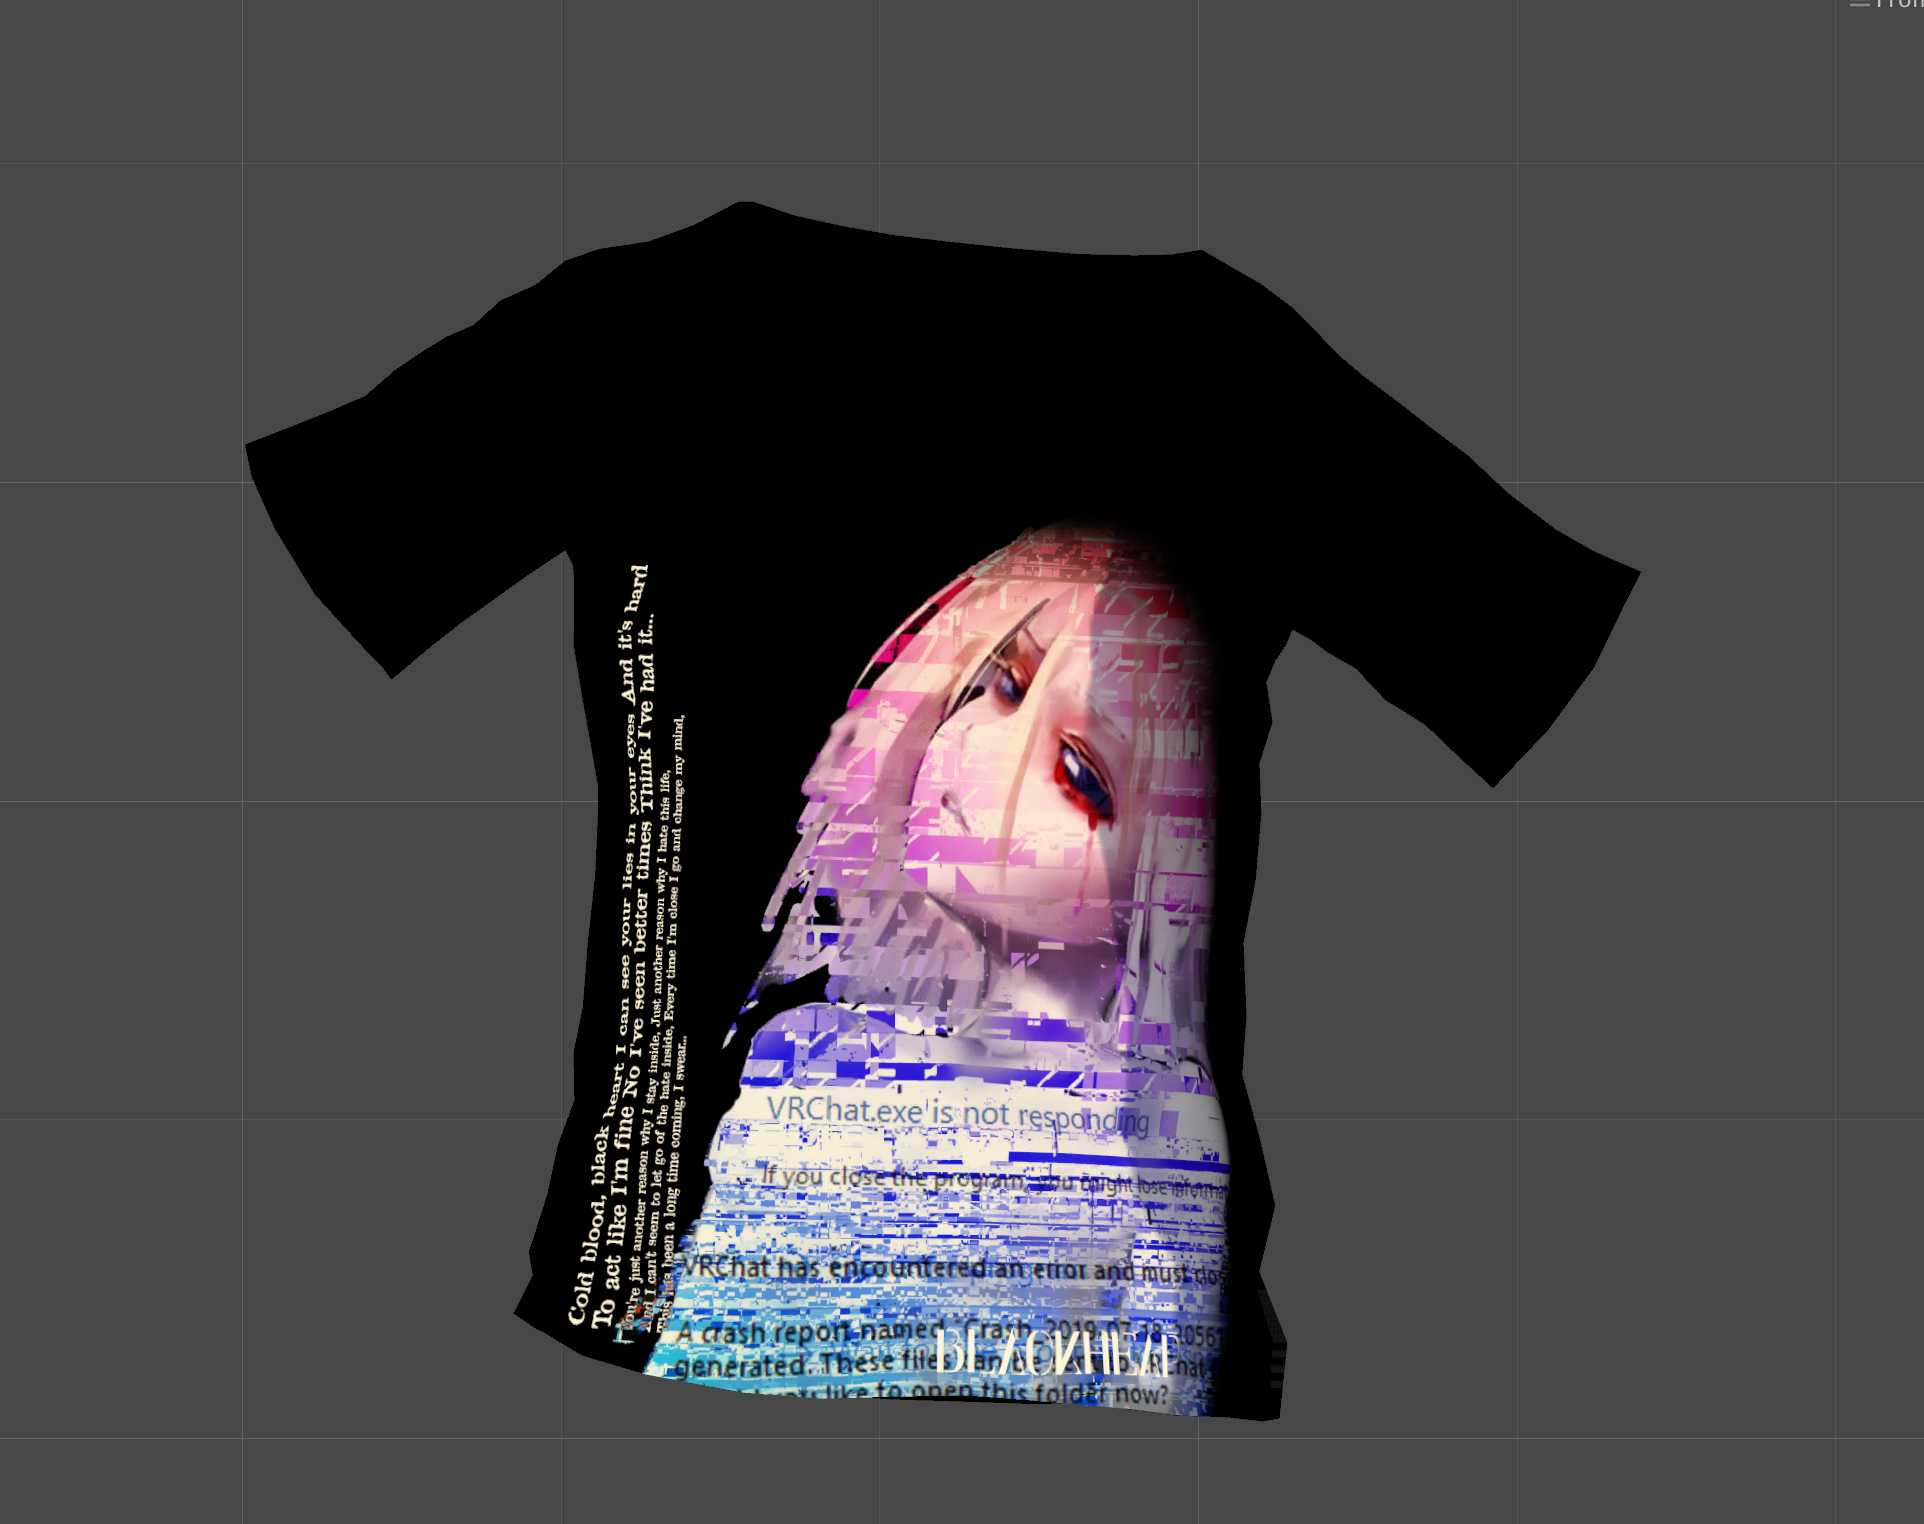 VRCMods - [Shirt] BlackHeart 1 - VRChat Avatars